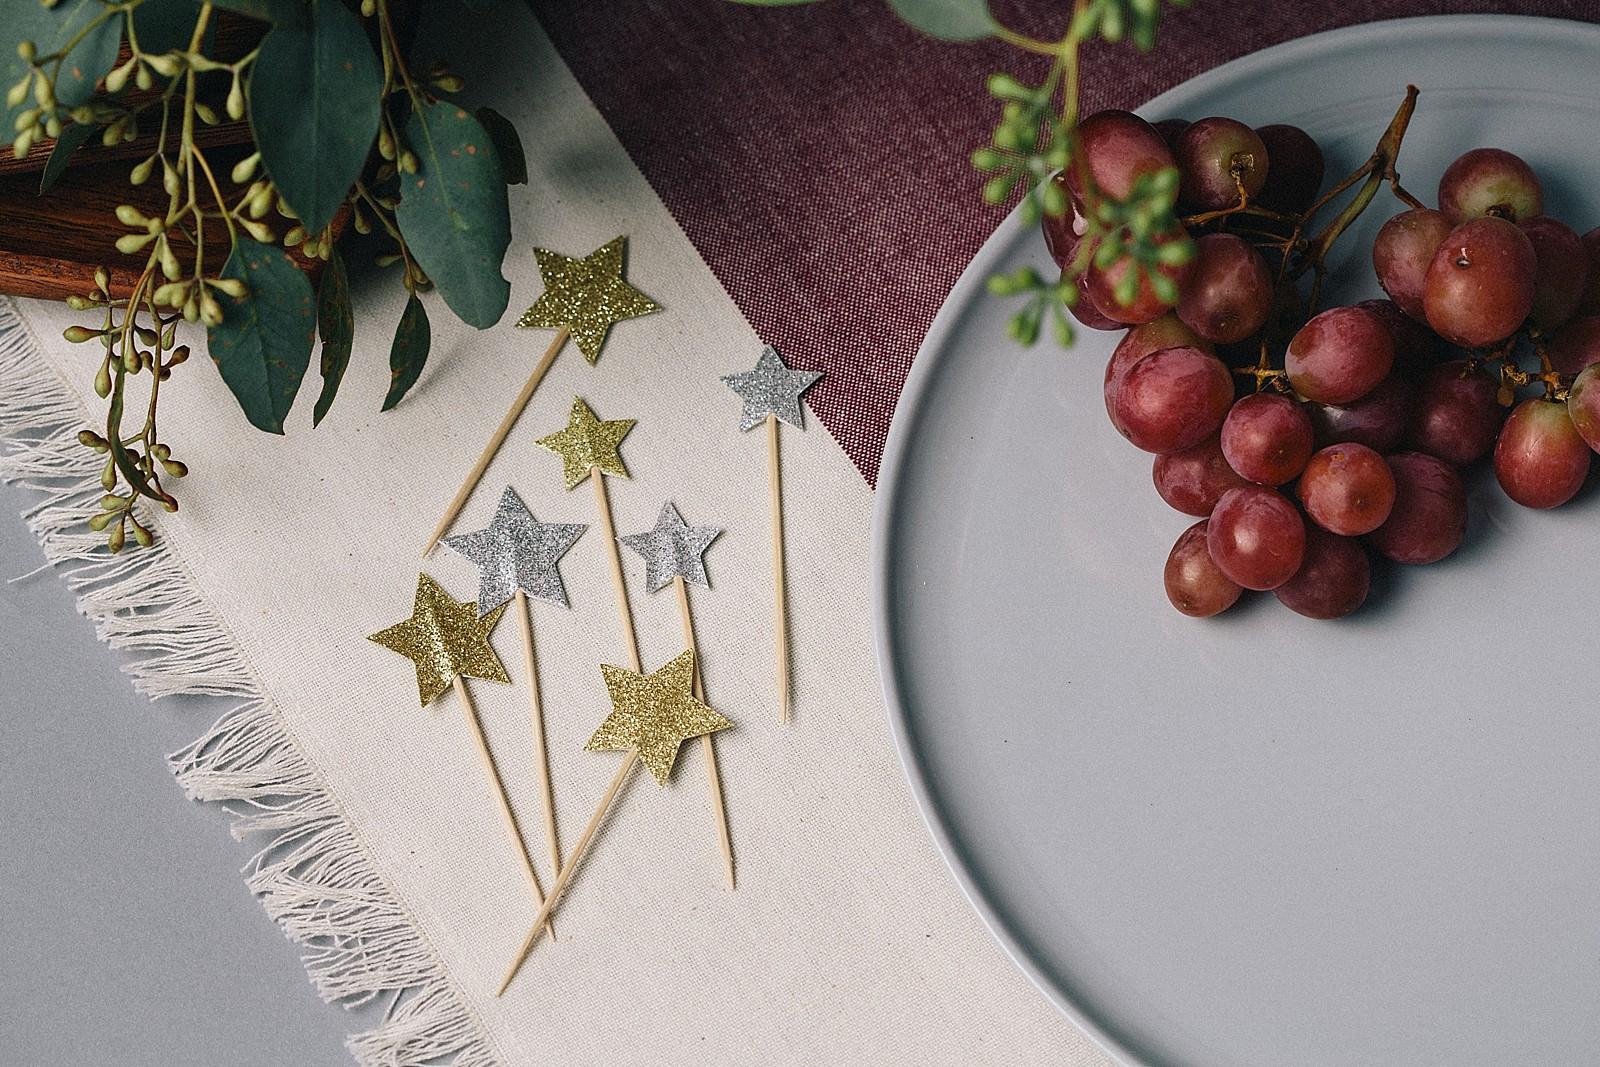 pro-flowers-burke-decor-thanksgiving-christmas-tablescape-idea-fall-popsugar-must-have-box-lifestyle-blogger-diana-elizabeth-blog-2191